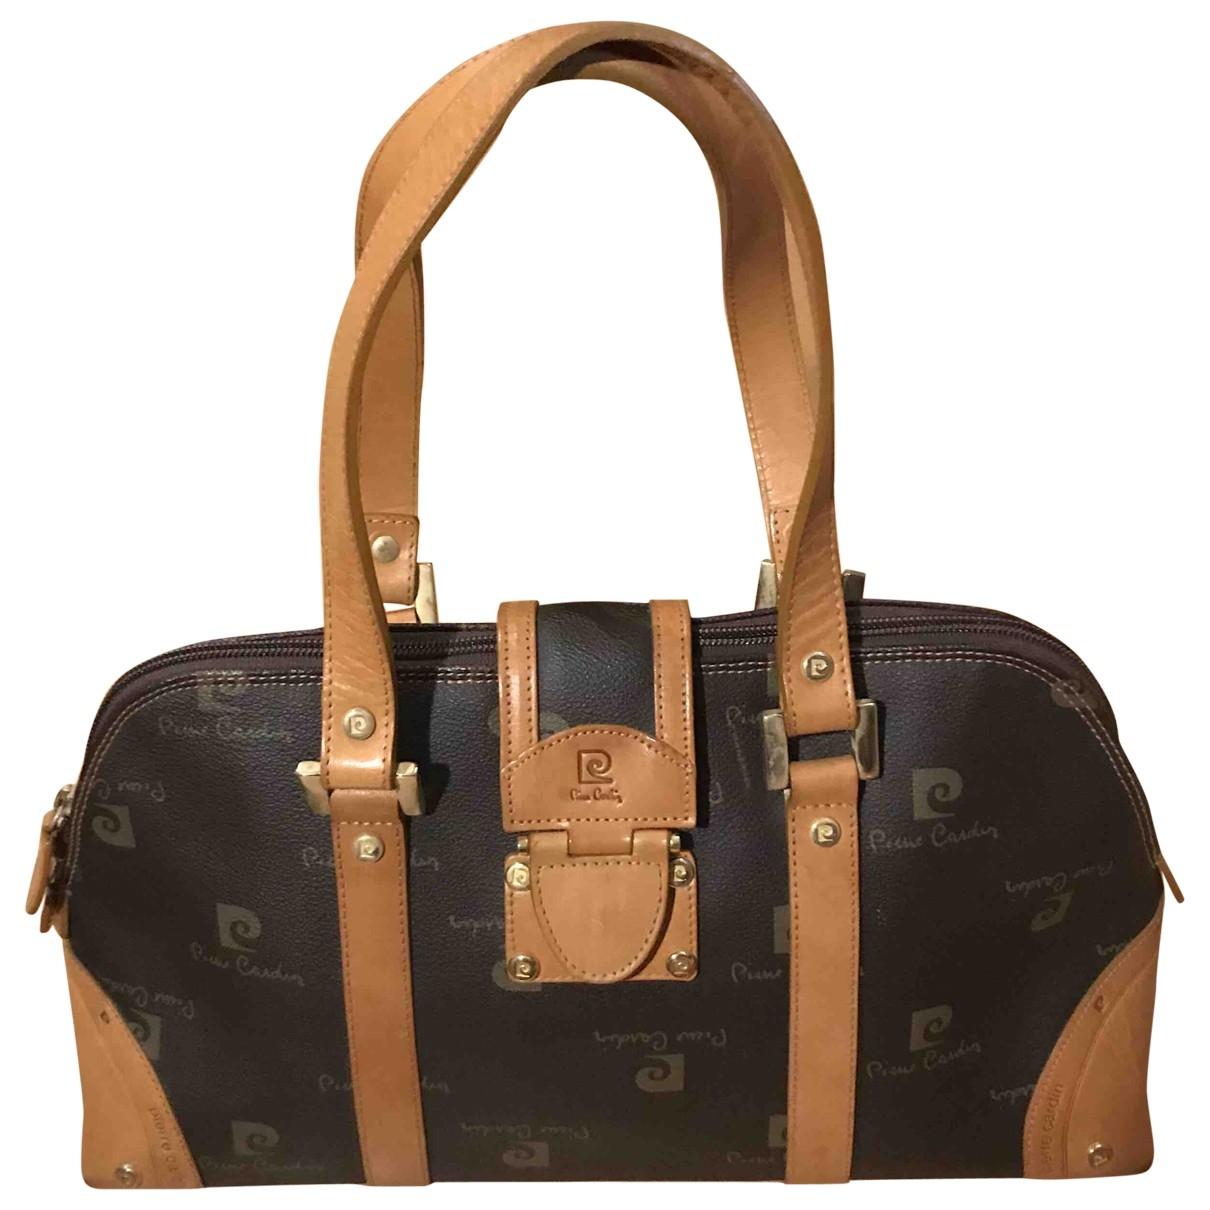 Pierre Cardin \N Brown Cloth handbag for Women \N